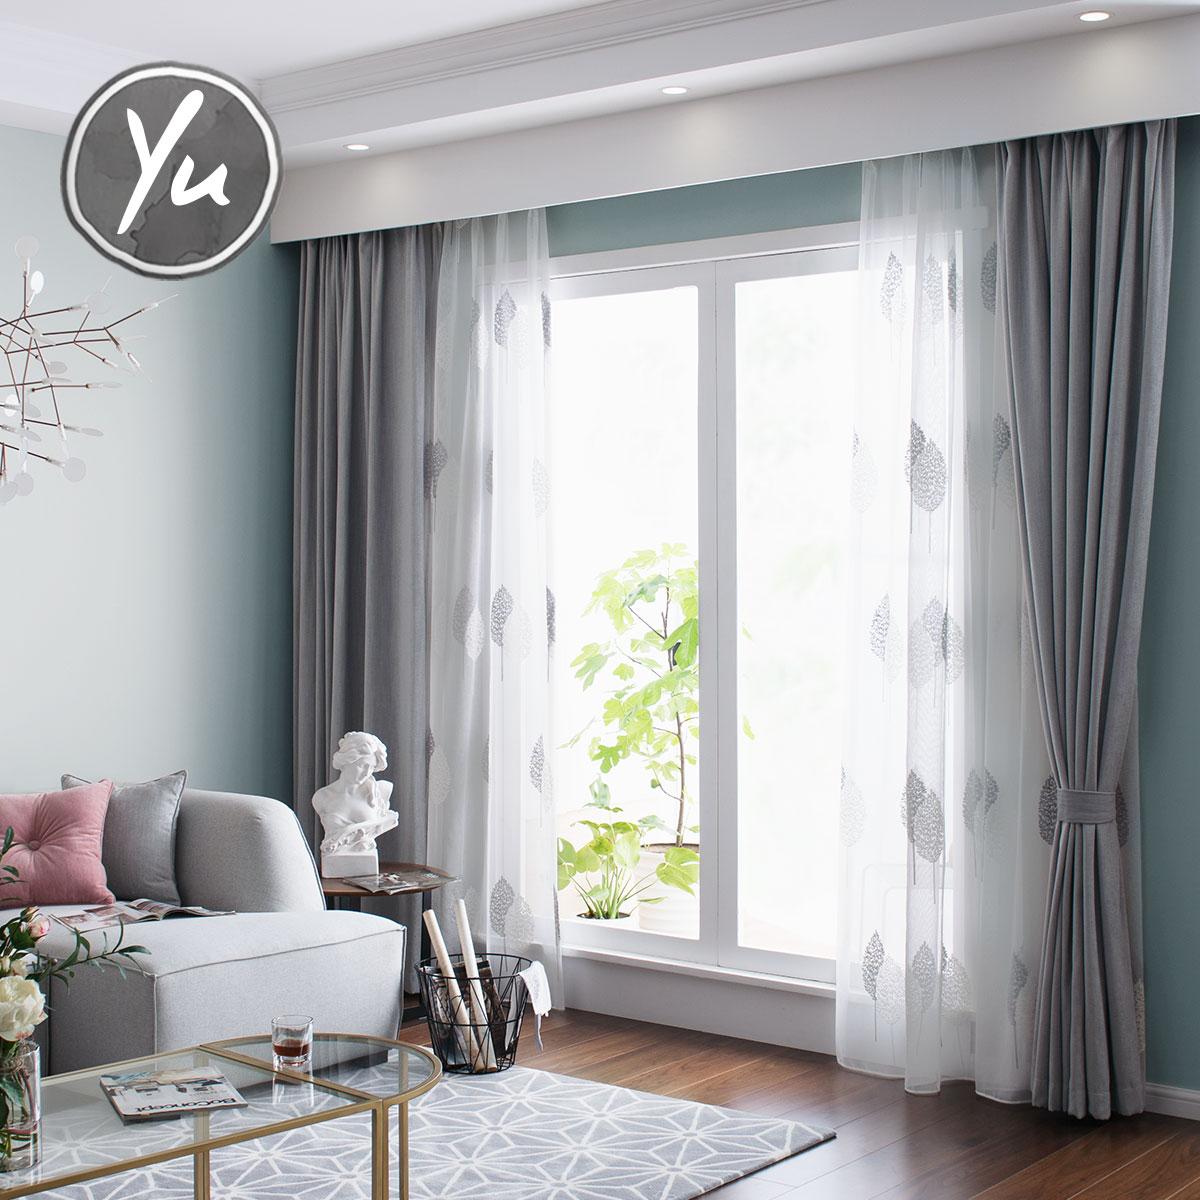 USD 29.56] Curtains Nordic Molandi window curtains cloth custom ...